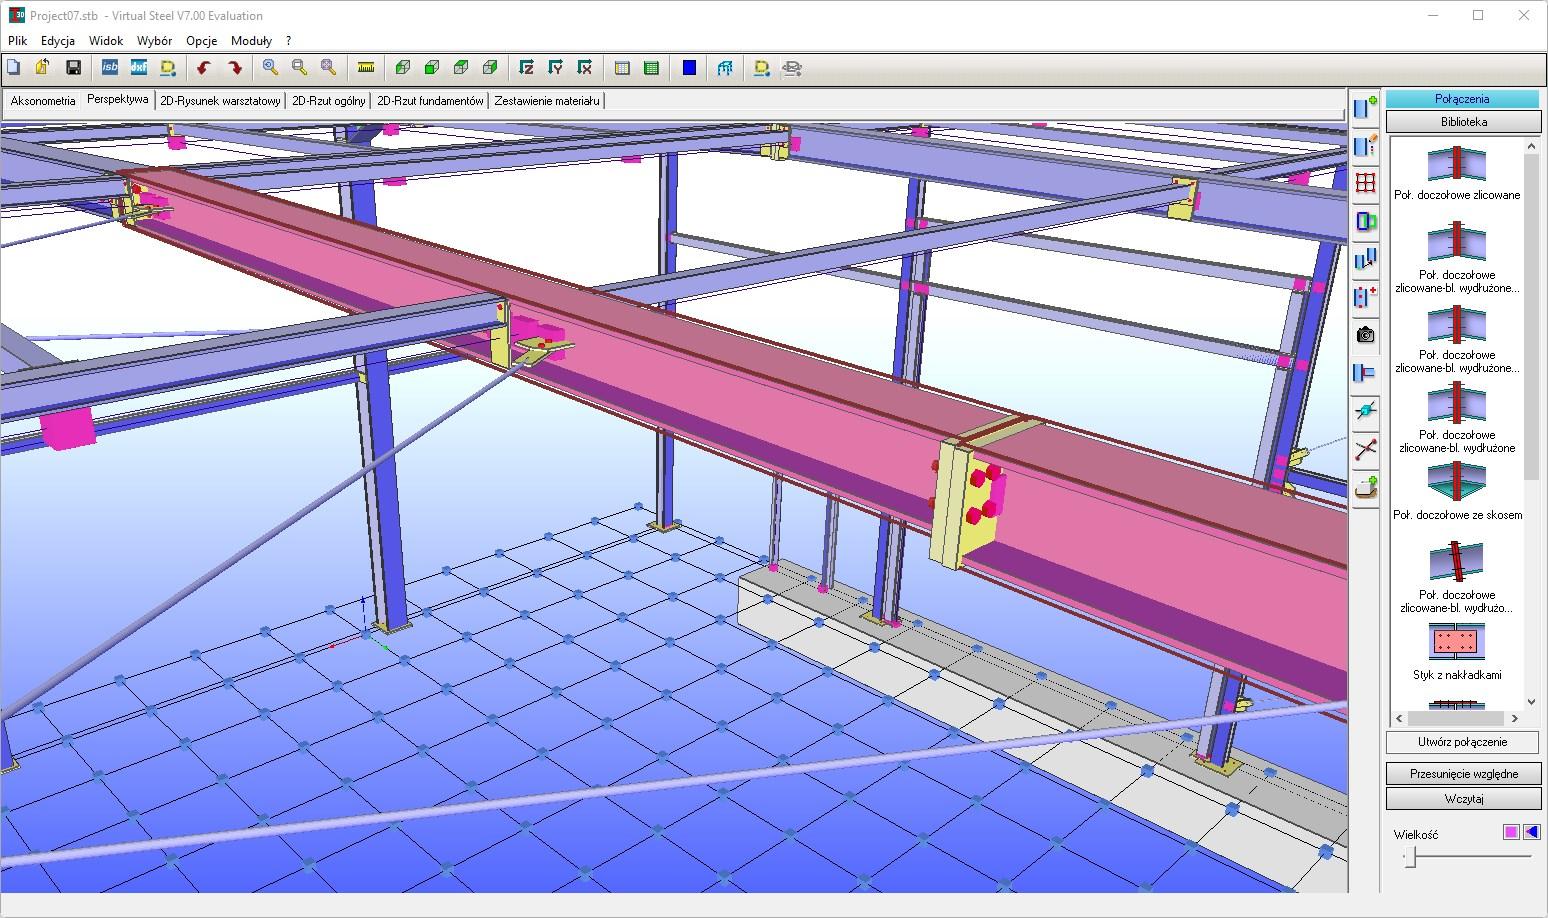 Modelowanie w Virtual Steel